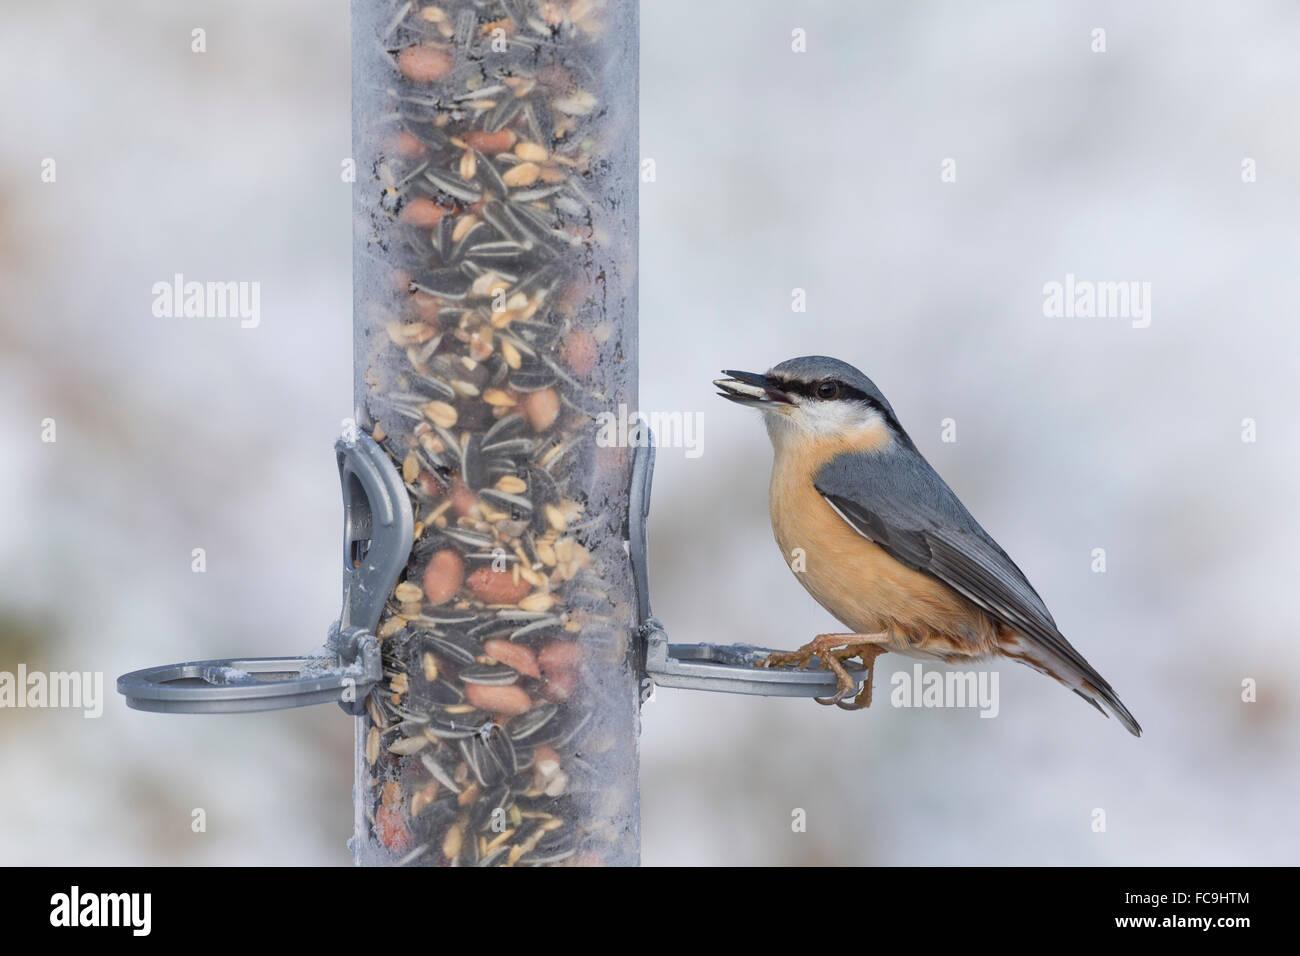 Trepador Azul, pájaro de alimentación, nieve, Kleiber, Spechtmeise, Vogelfütterung, Invierno, Schnee, Imagen De Stock